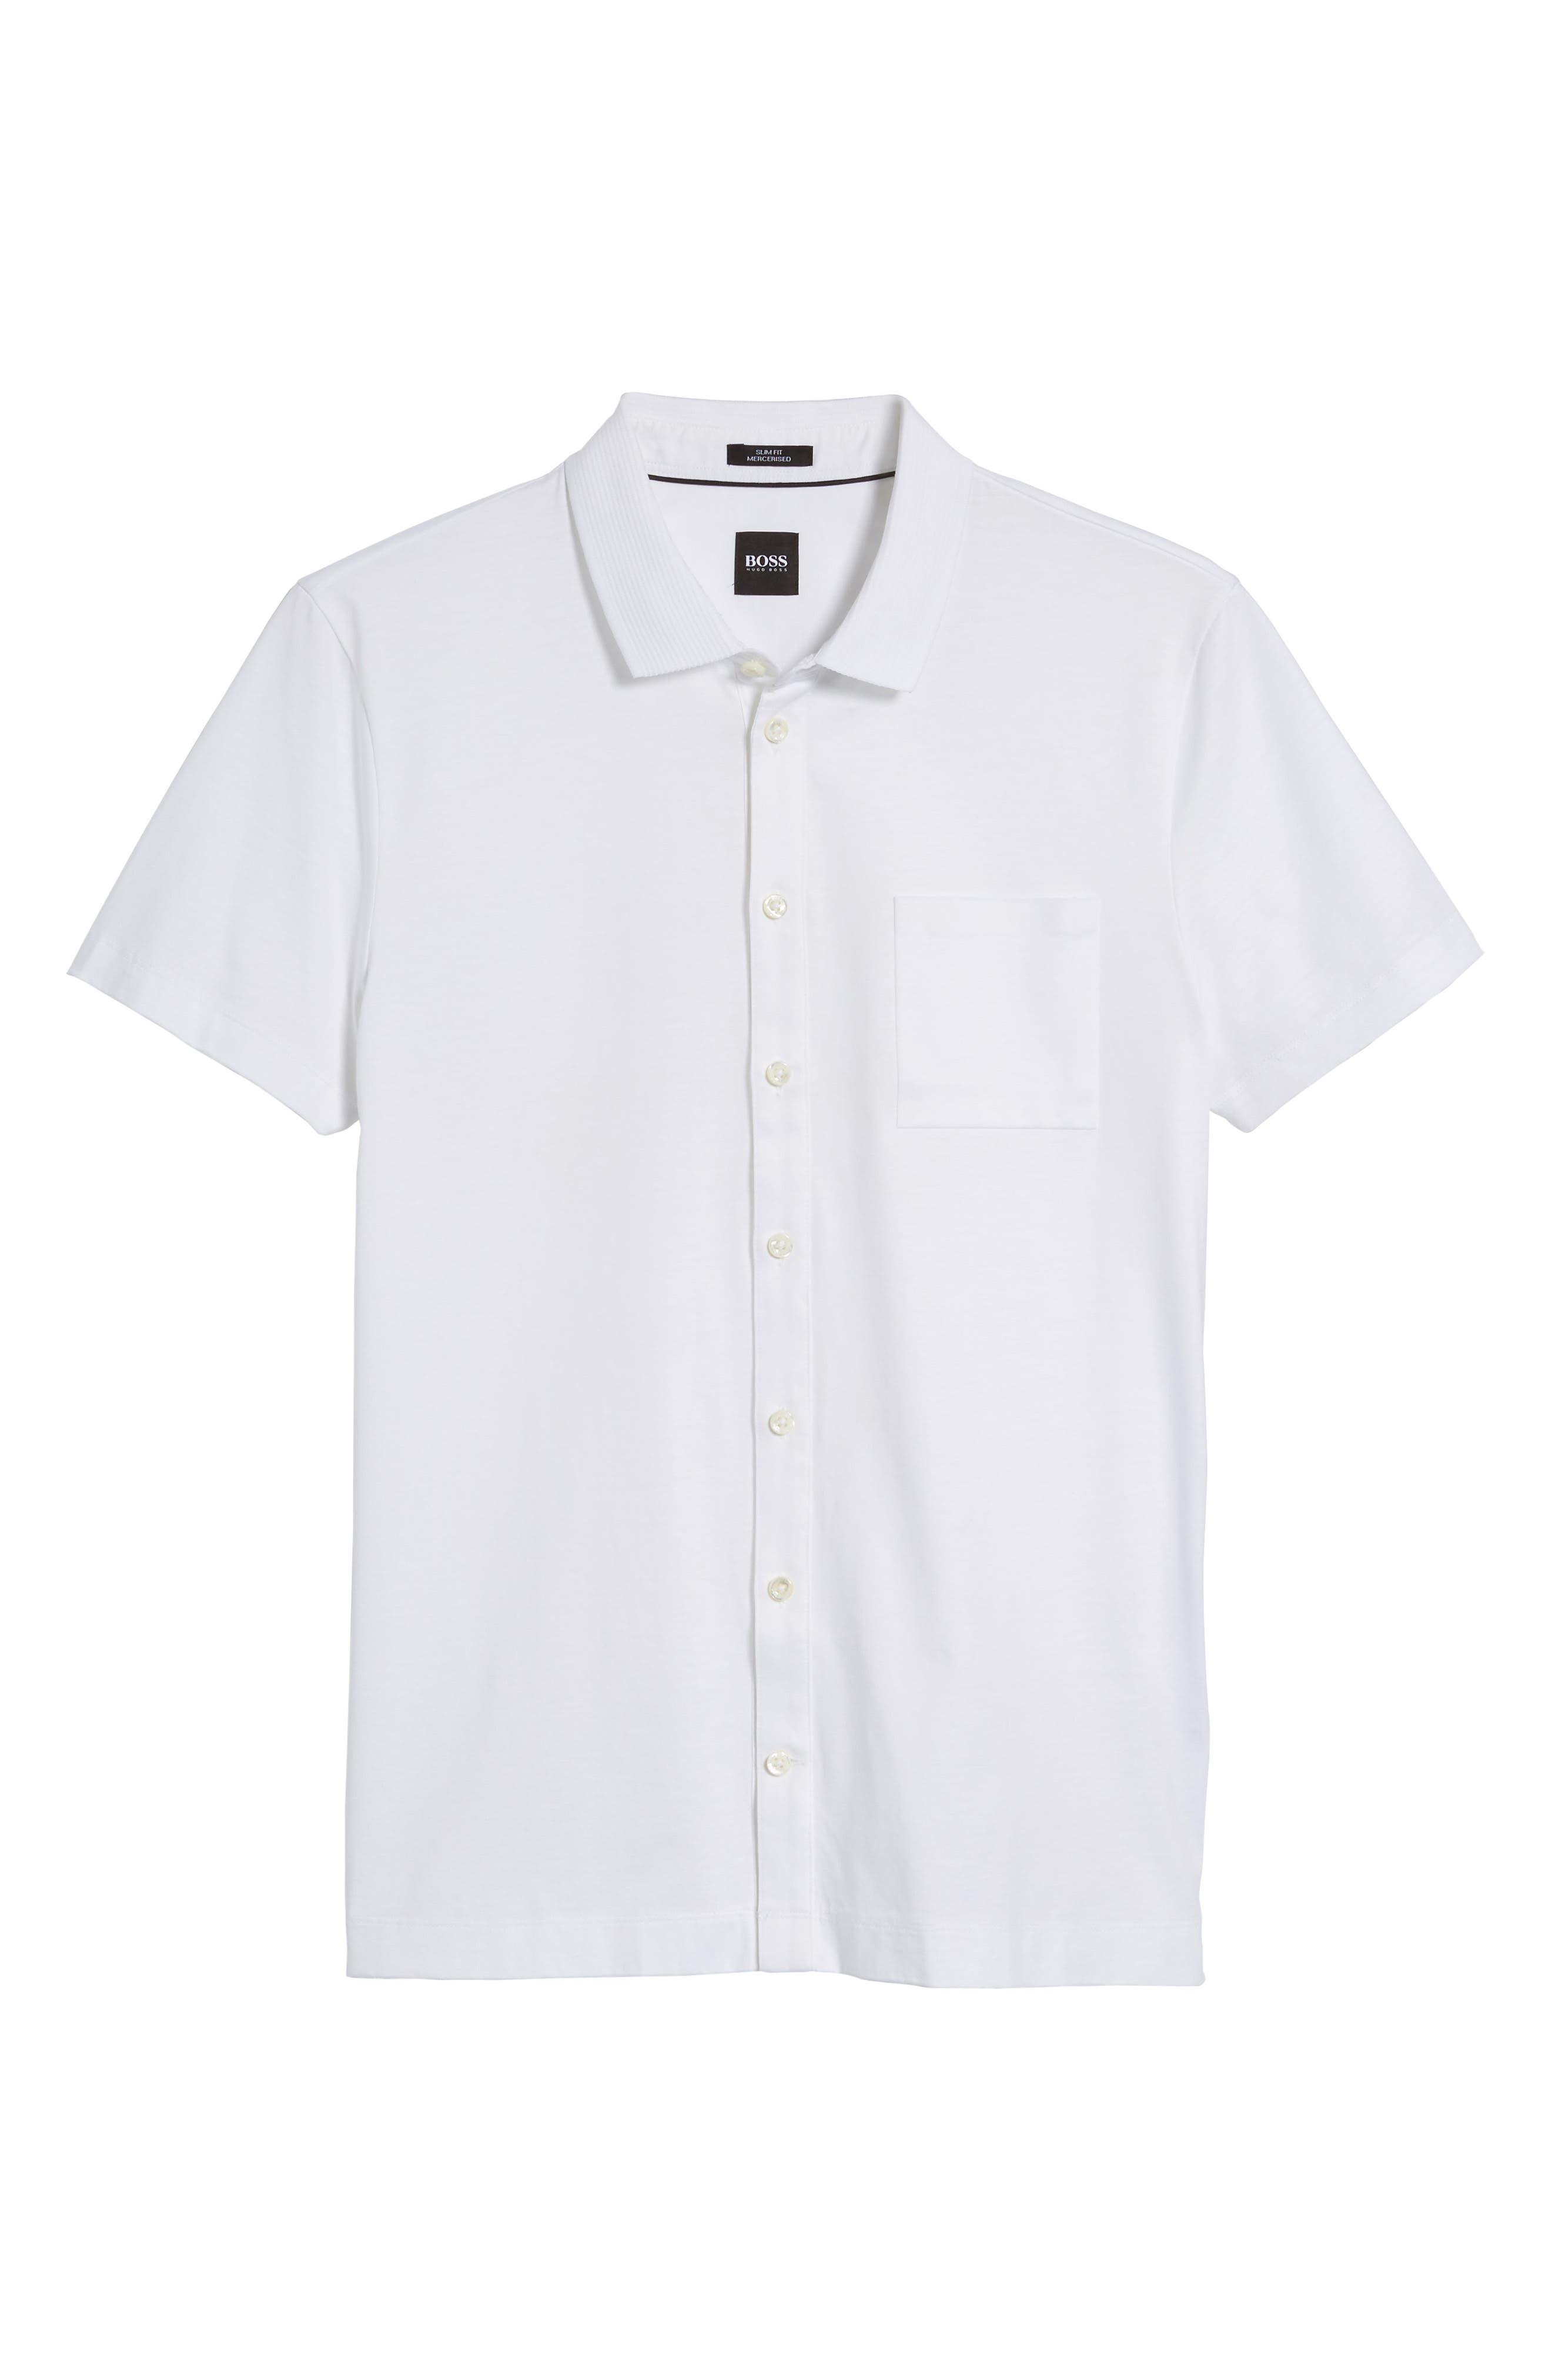 Puno Slim Fit Short Sleeve Sport Shirt,                             Alternate thumbnail 6, color,                             100